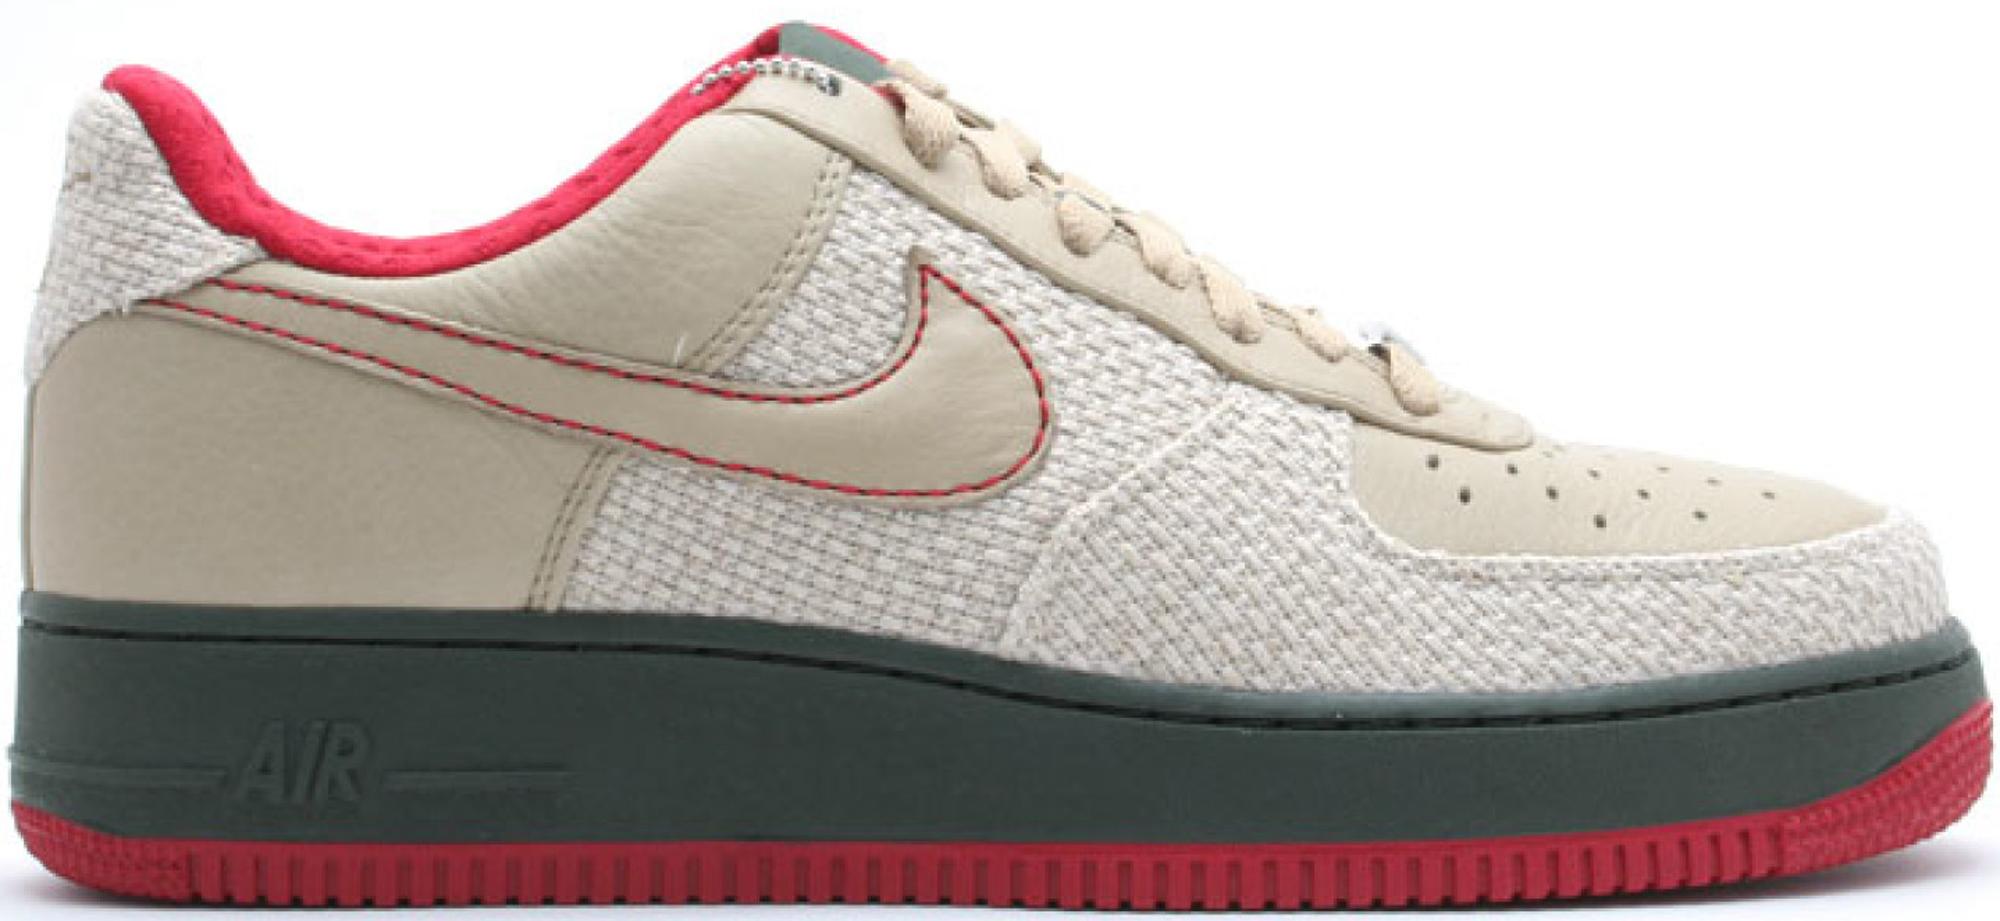 Nike Air Force 1 Low China (2007